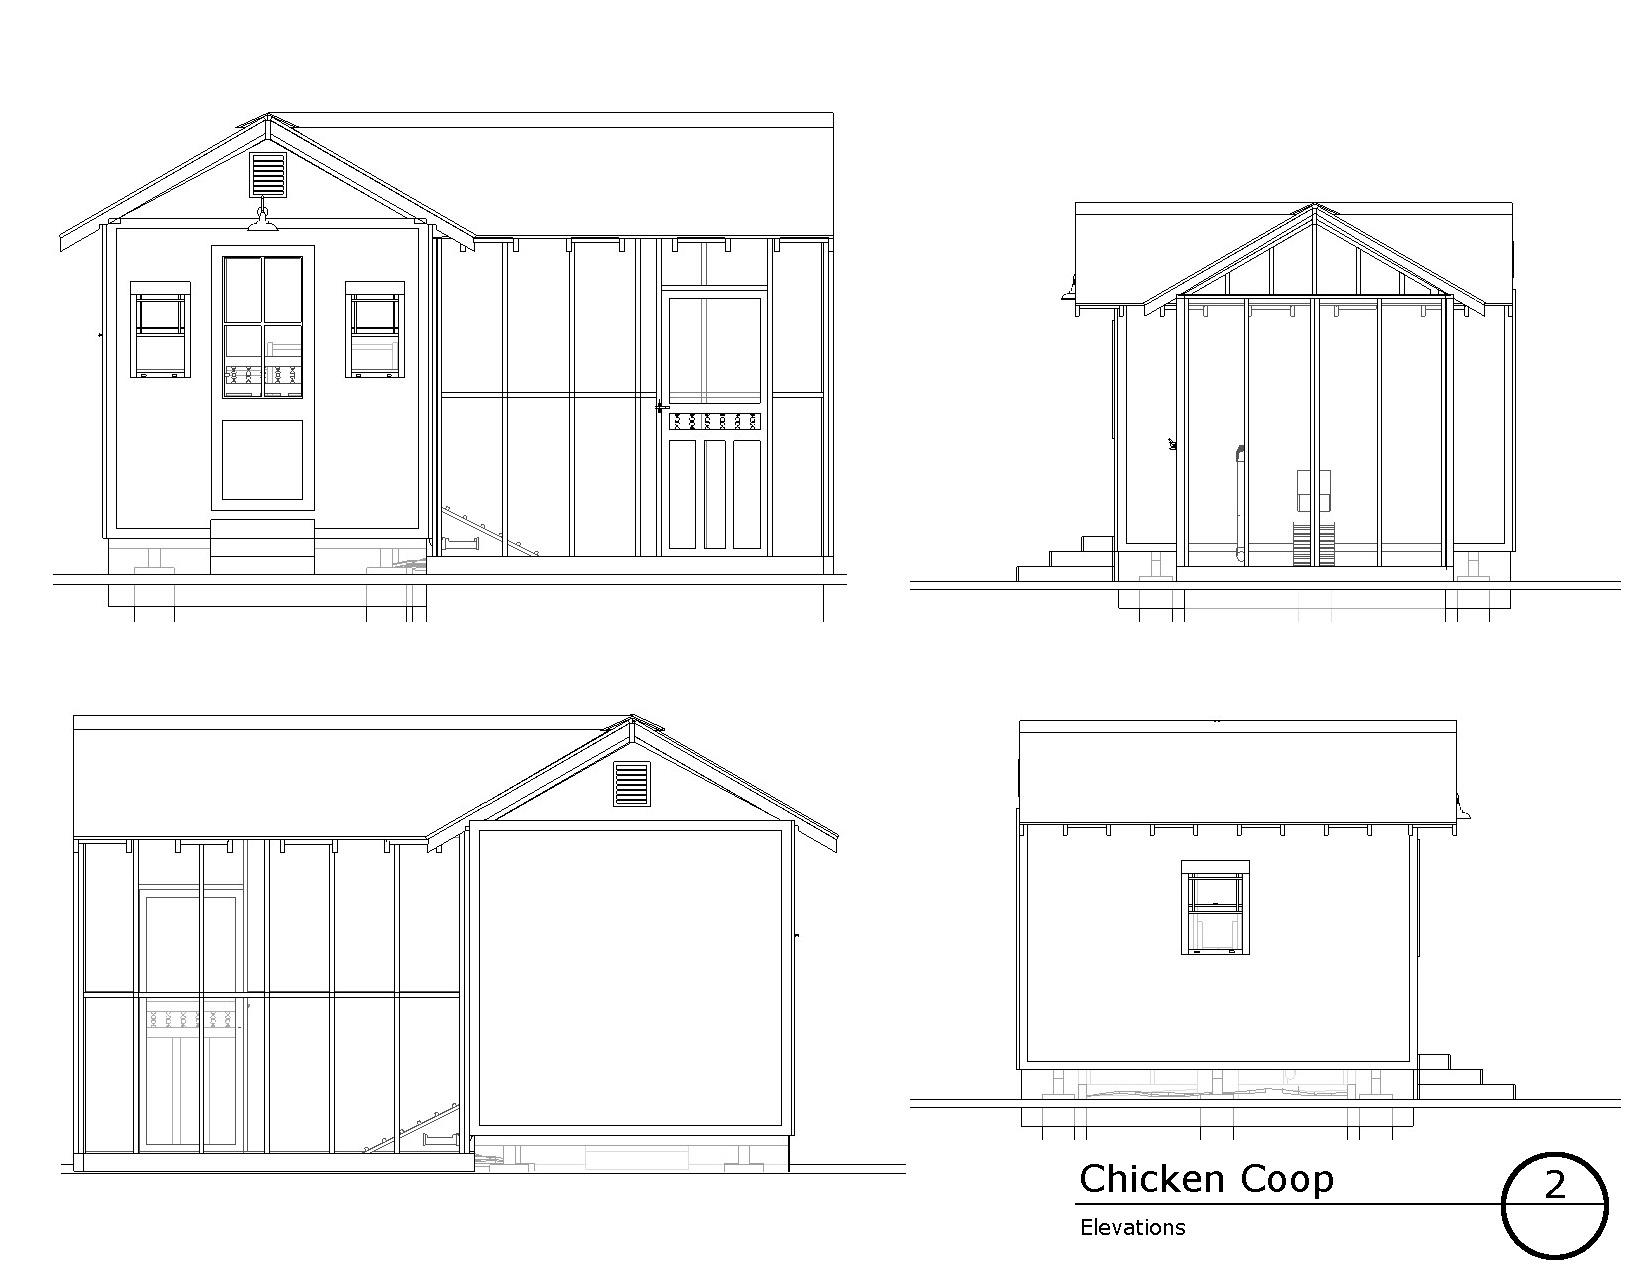 Chicken coop blueprints_Page_2.jpg